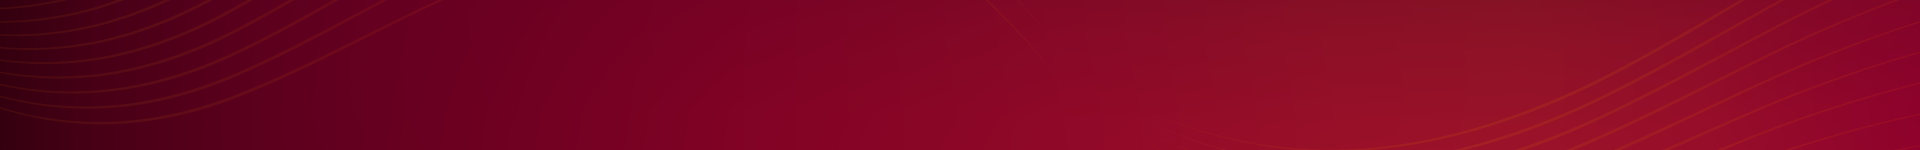 brocade-pagebanner-alcadis